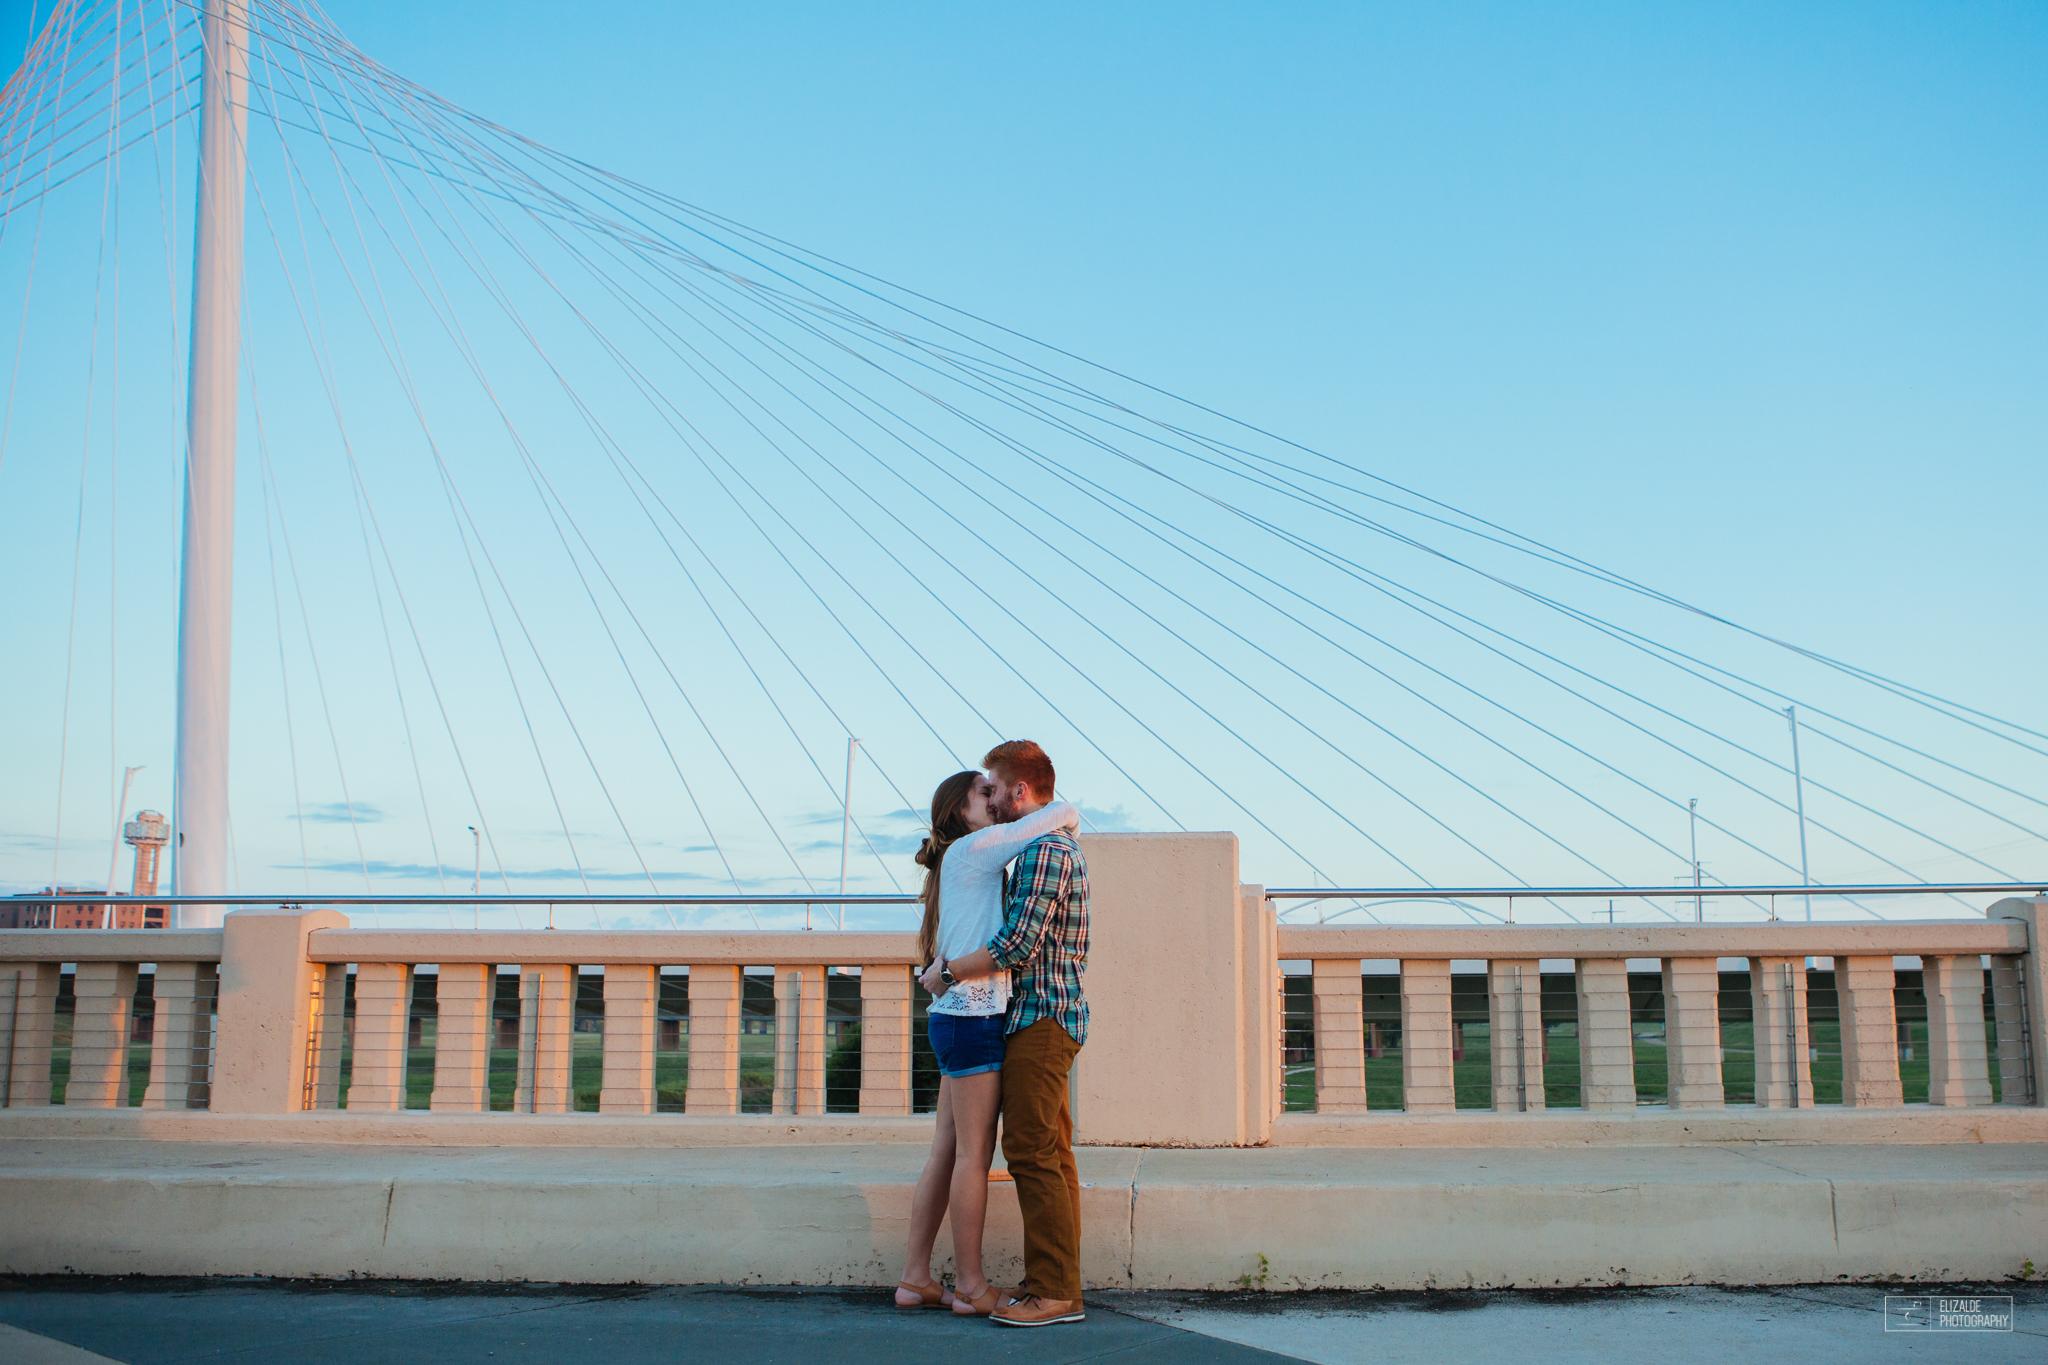 Proposal_DFW Wedding Photographer_Dallas Photographer_Elizalde Photography_margaret hunt hill bridge (10 of 21).jpg